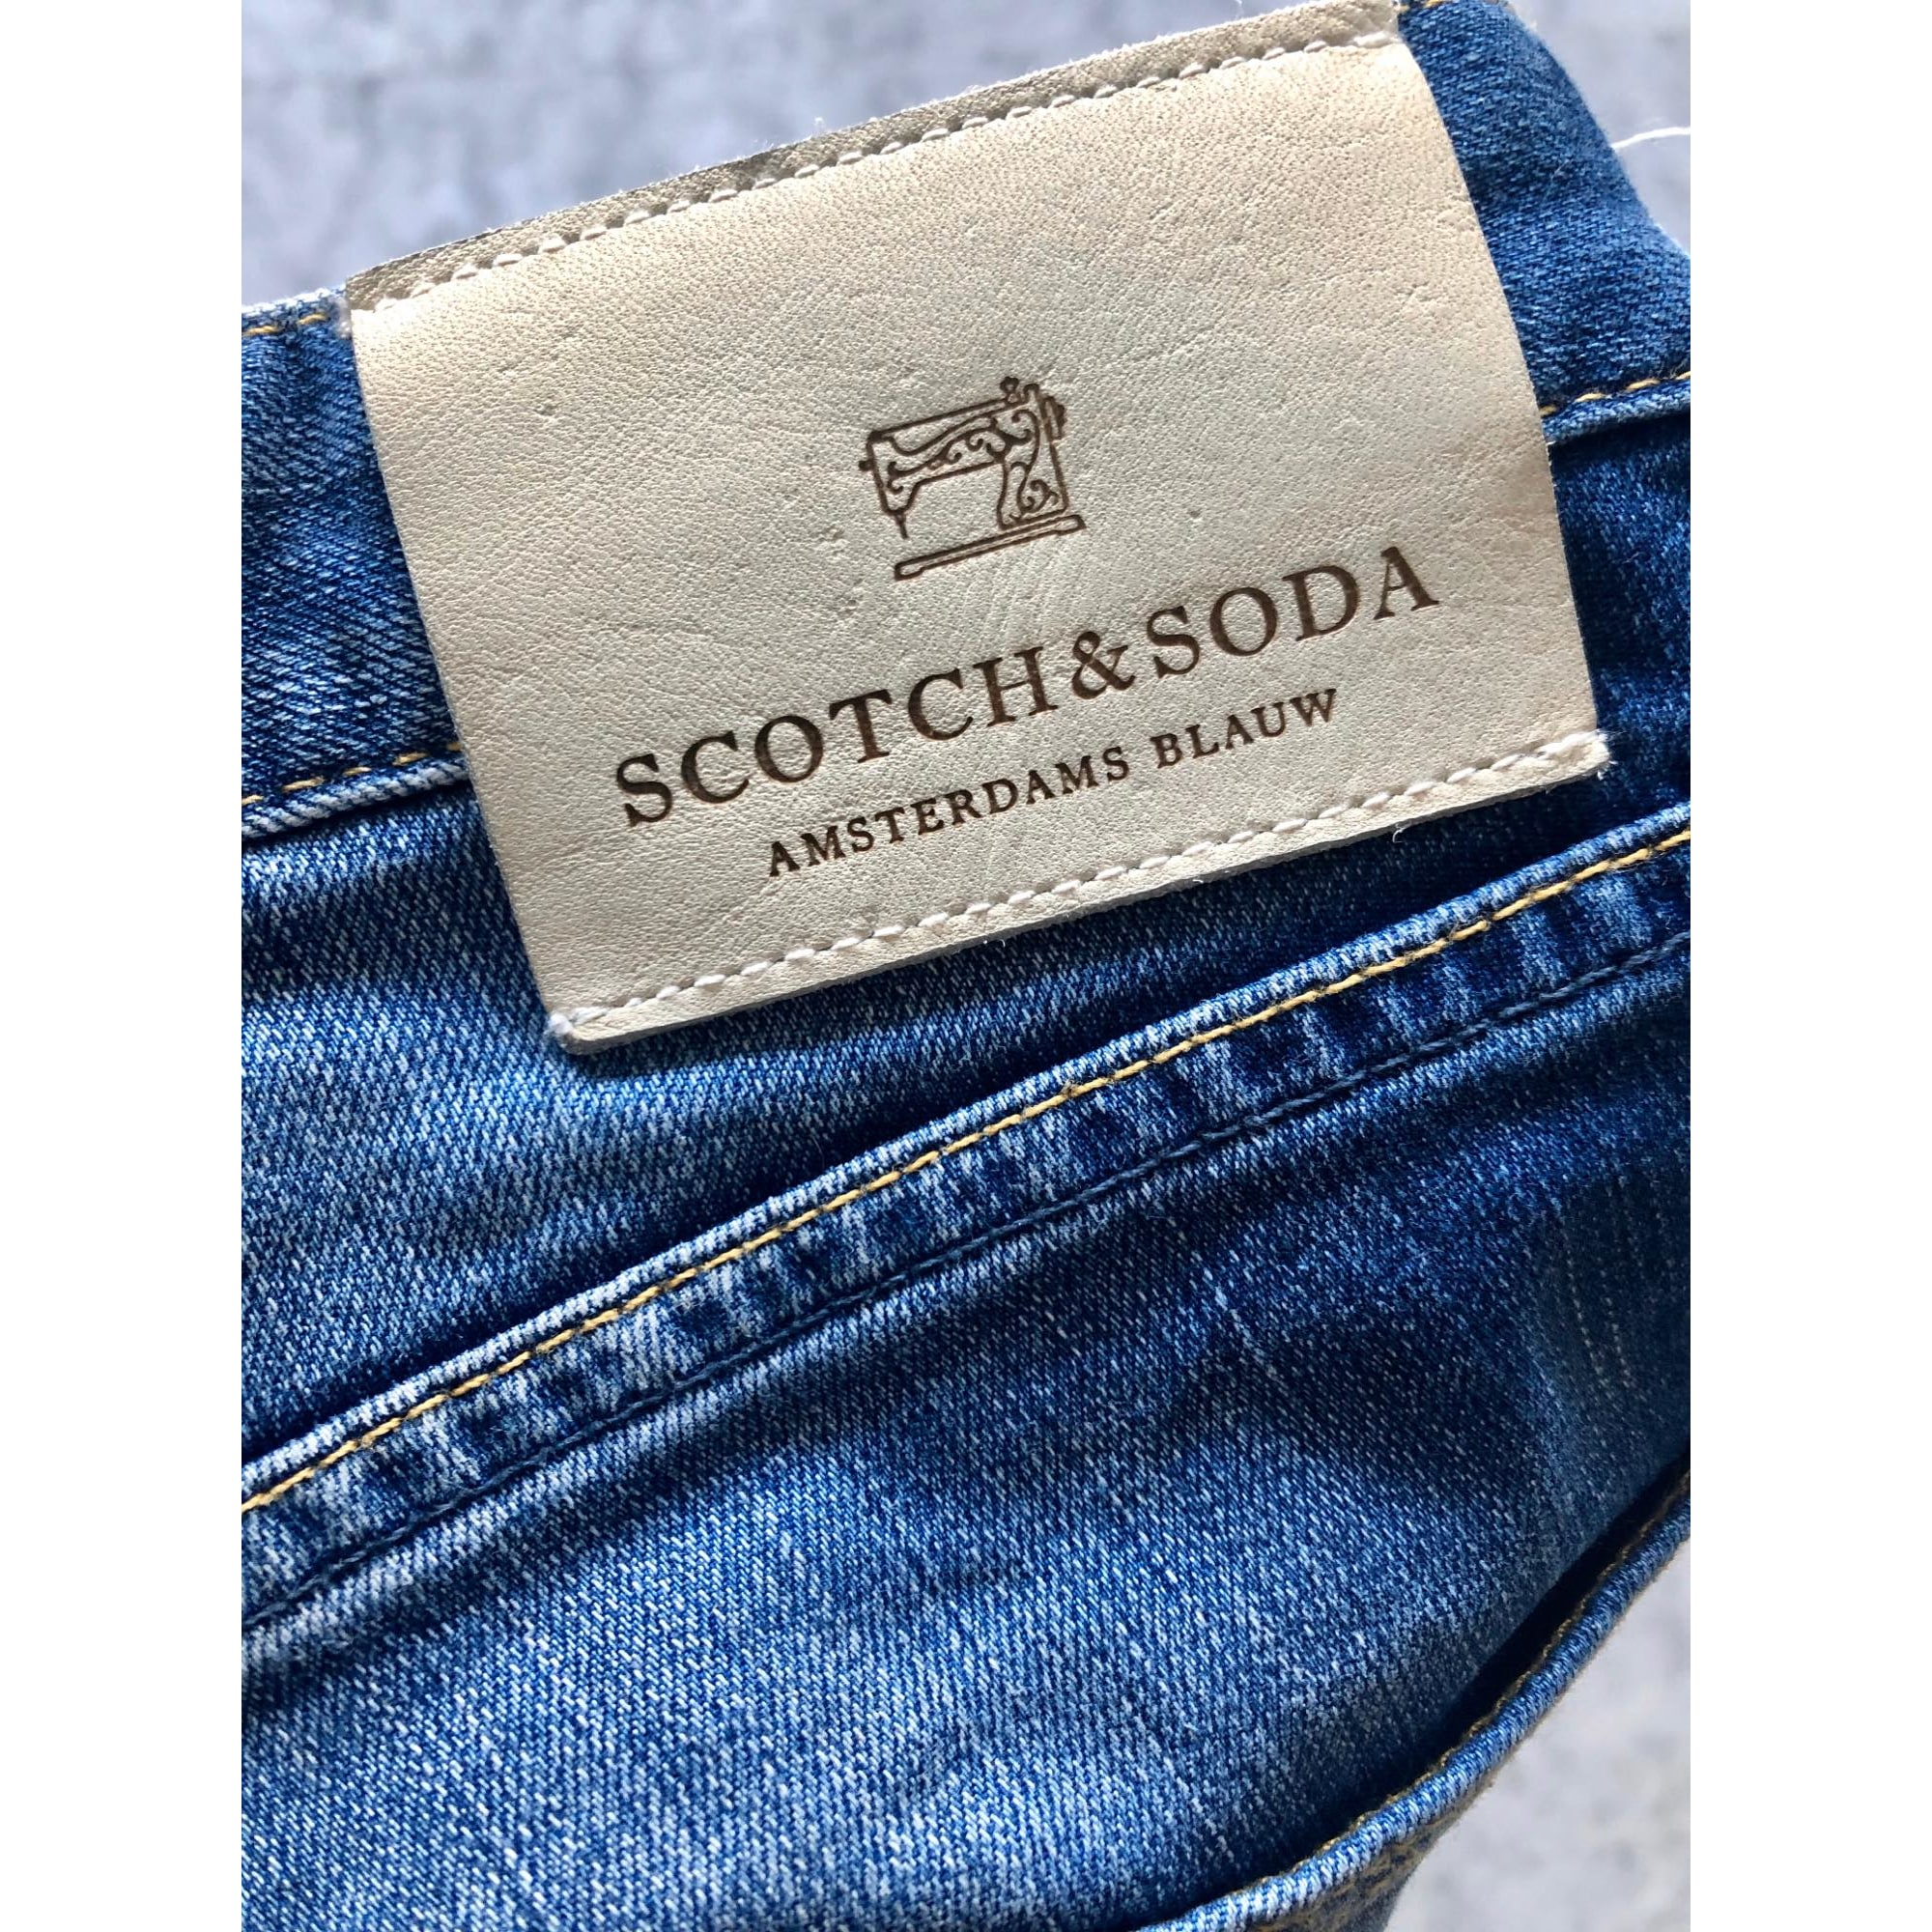 Jeans slim SCOTCH & SODA Bleu, bleu marine, bleu turquoise